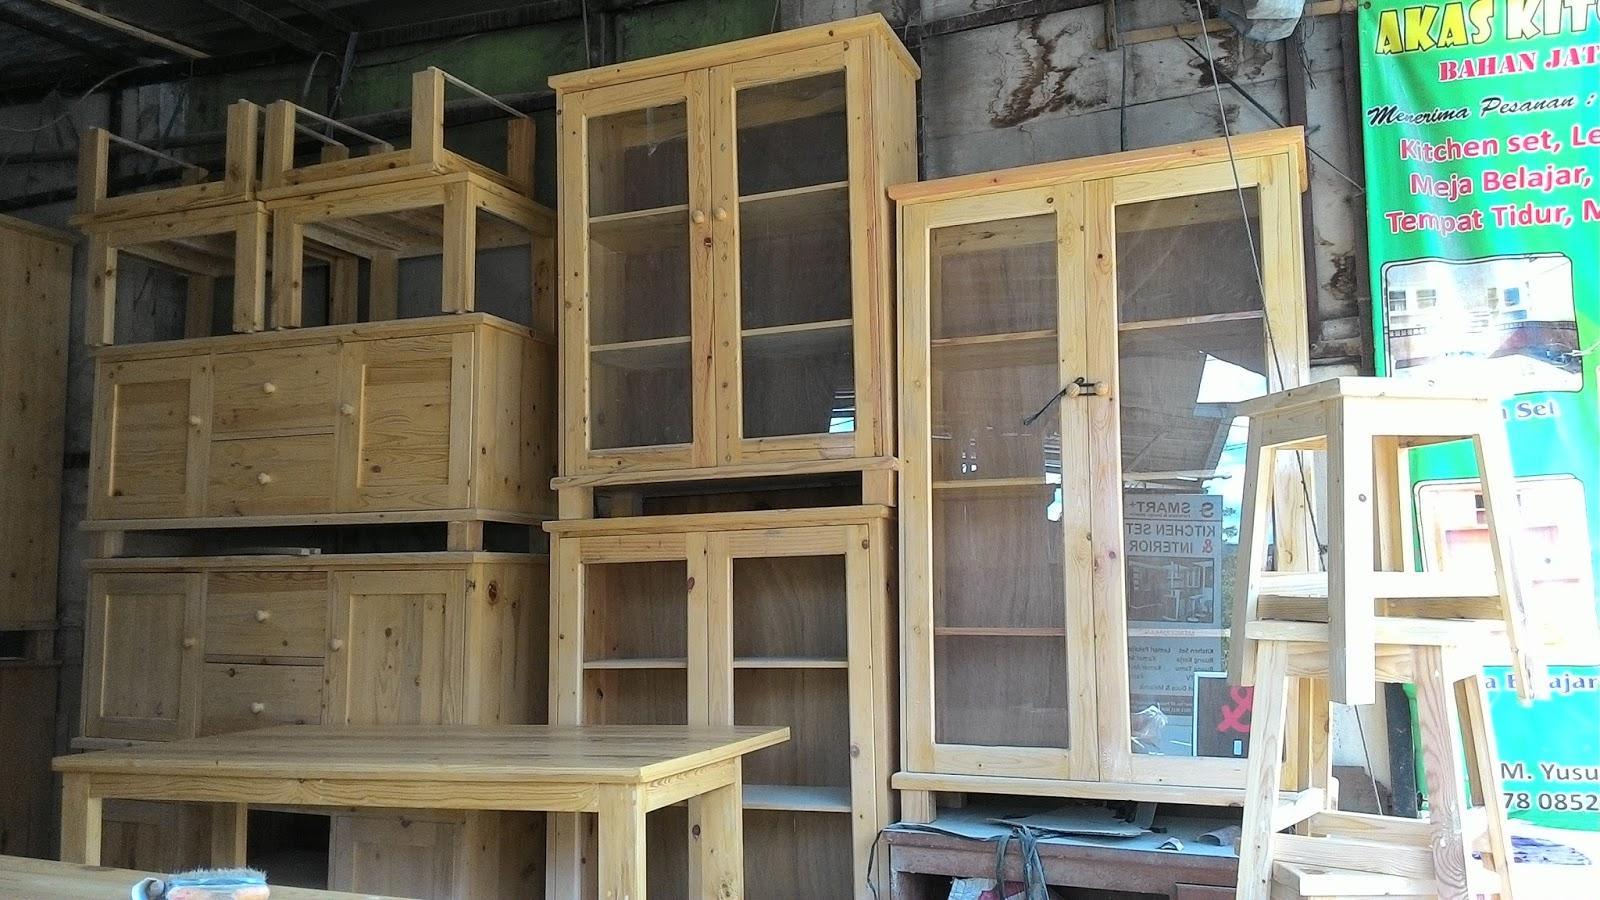 Furniture Kayu Jati Belanda Akas Kitchen Set Di Depok Ceritaasikaja